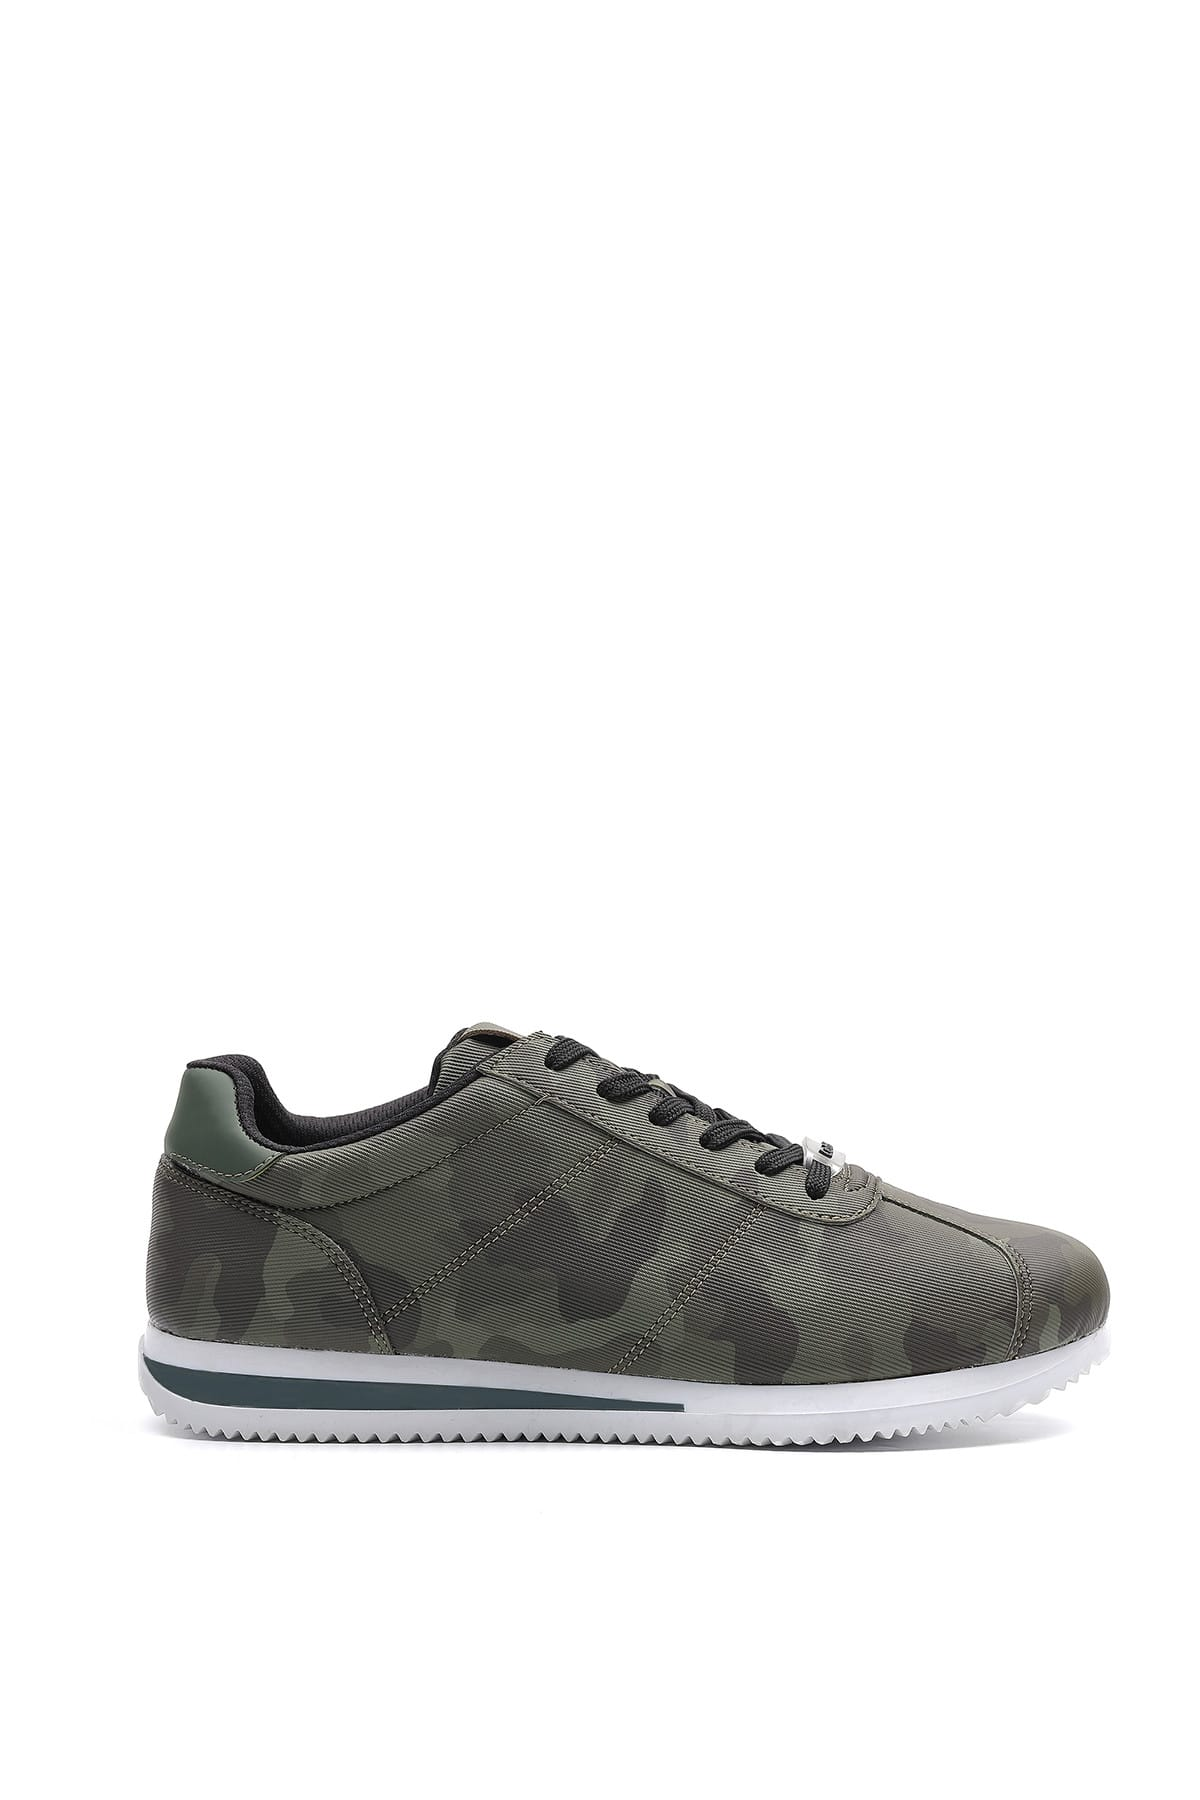 LETOON Erkek haki Sneaker - 7022T - 001M 7022T 1